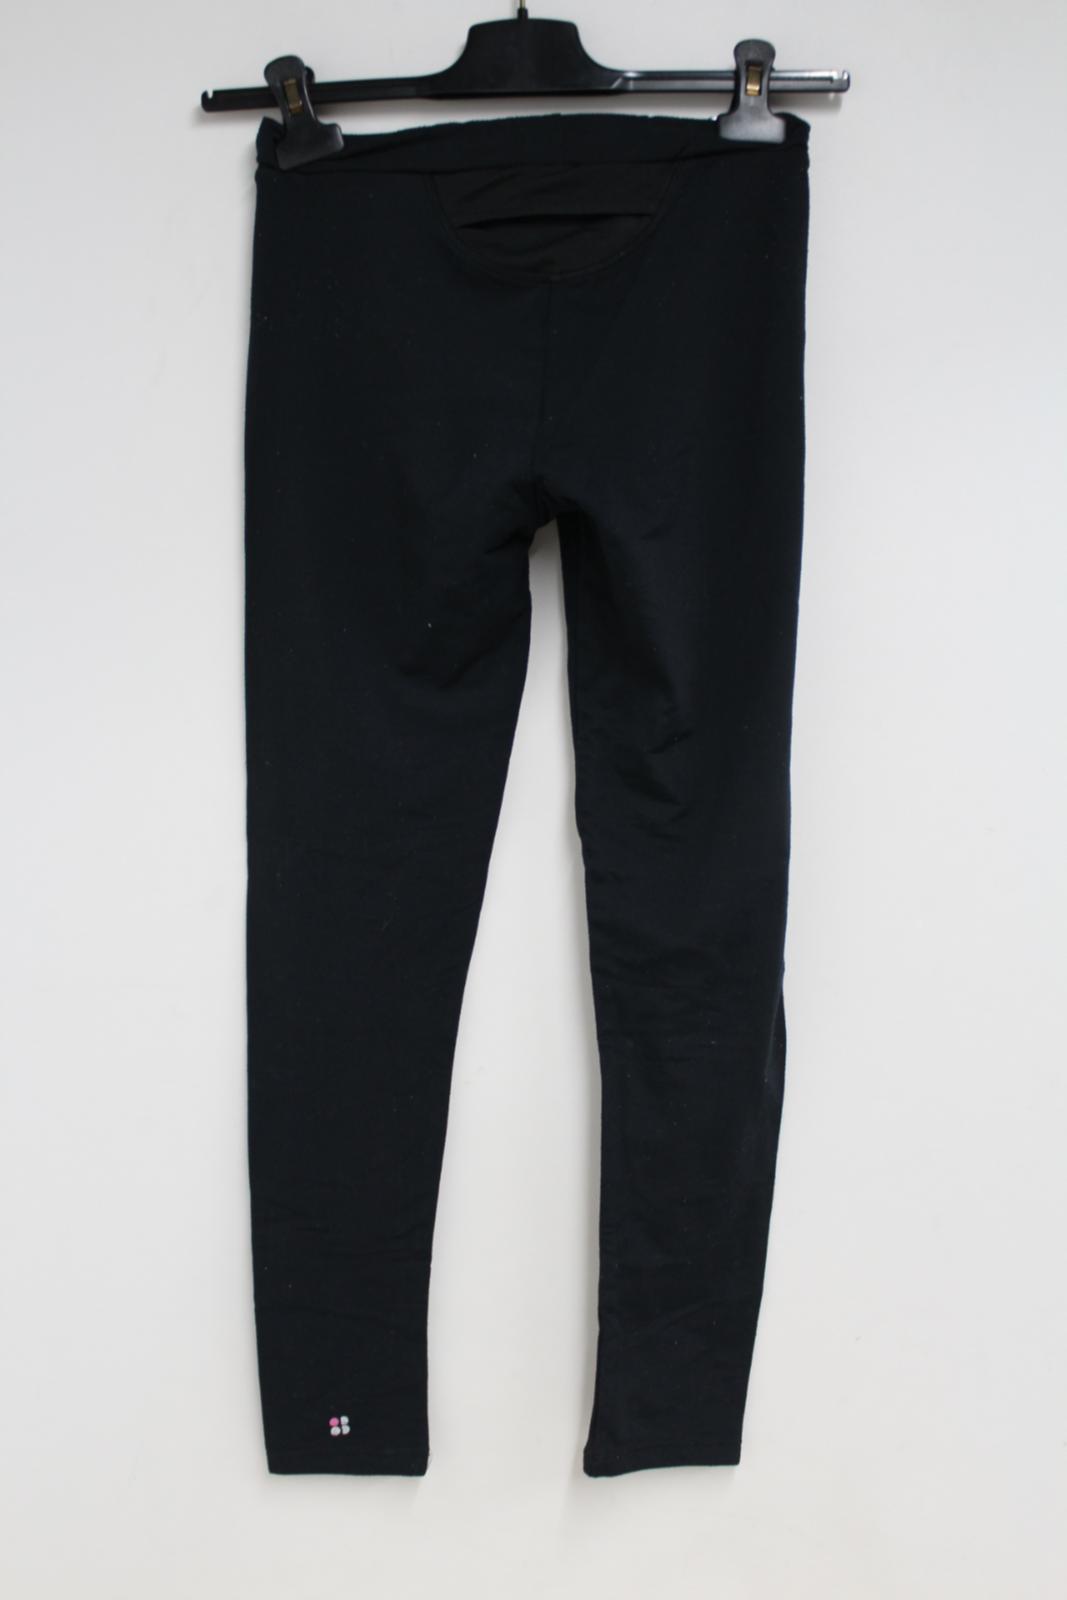 Sweaty-Betty-Ladies-Negro-Chandal-Activewear-Fitness-Leggings-Talla-S-W24-L26 miniatura 7